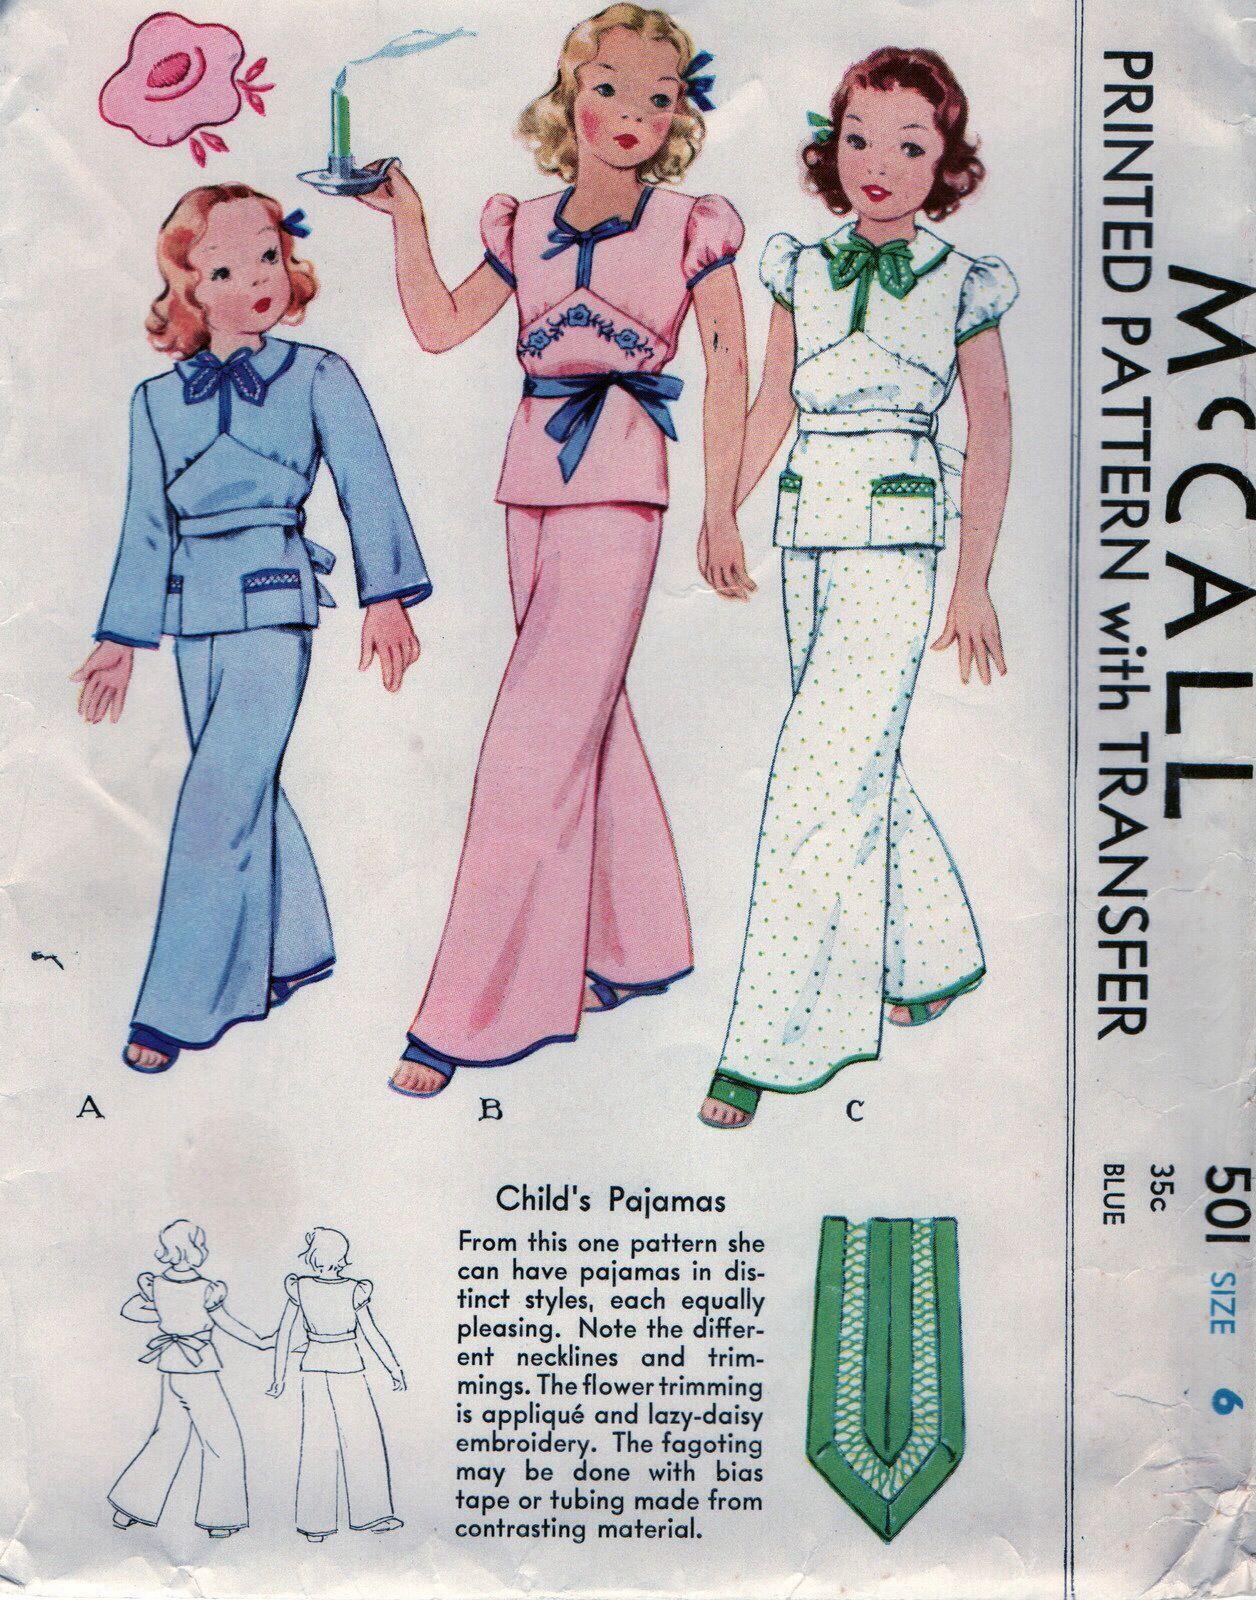 Childs pajamas 1930s sewing pattern design inspiration childs pajamas 1930s sewing pattern jeuxipadfo Choice Image